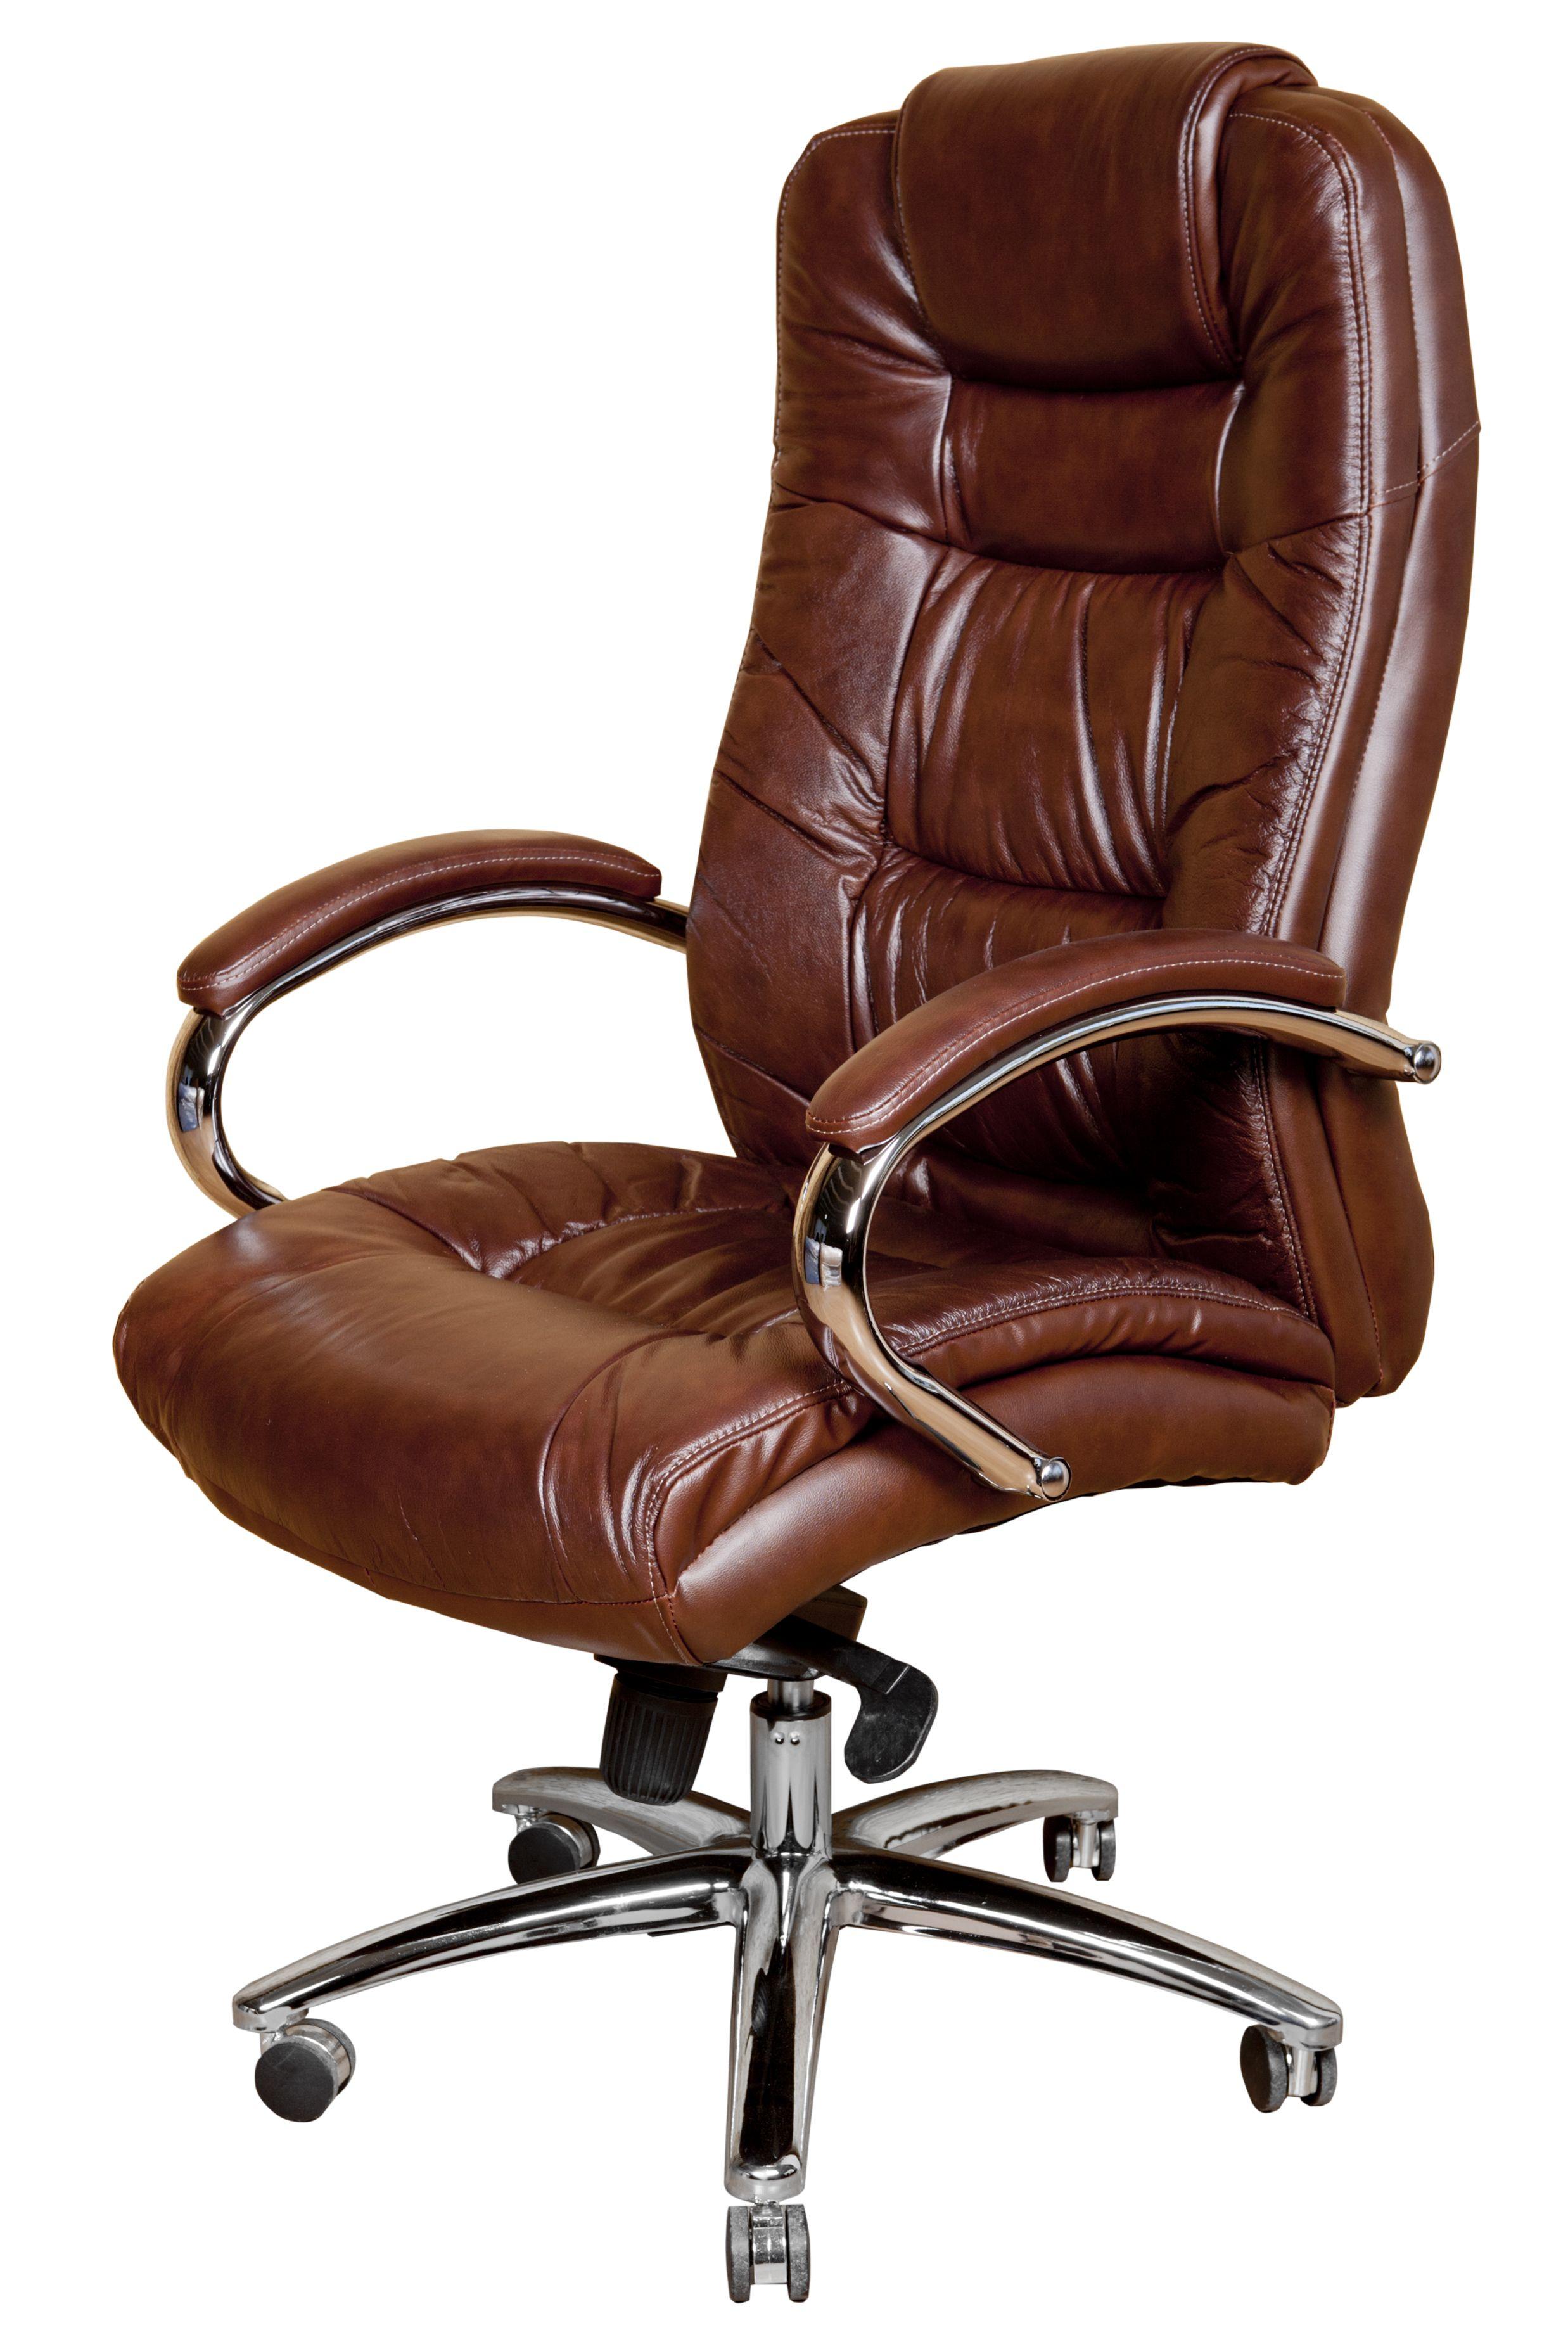 Biuro kėdė MONTEREY Premium pu ruda